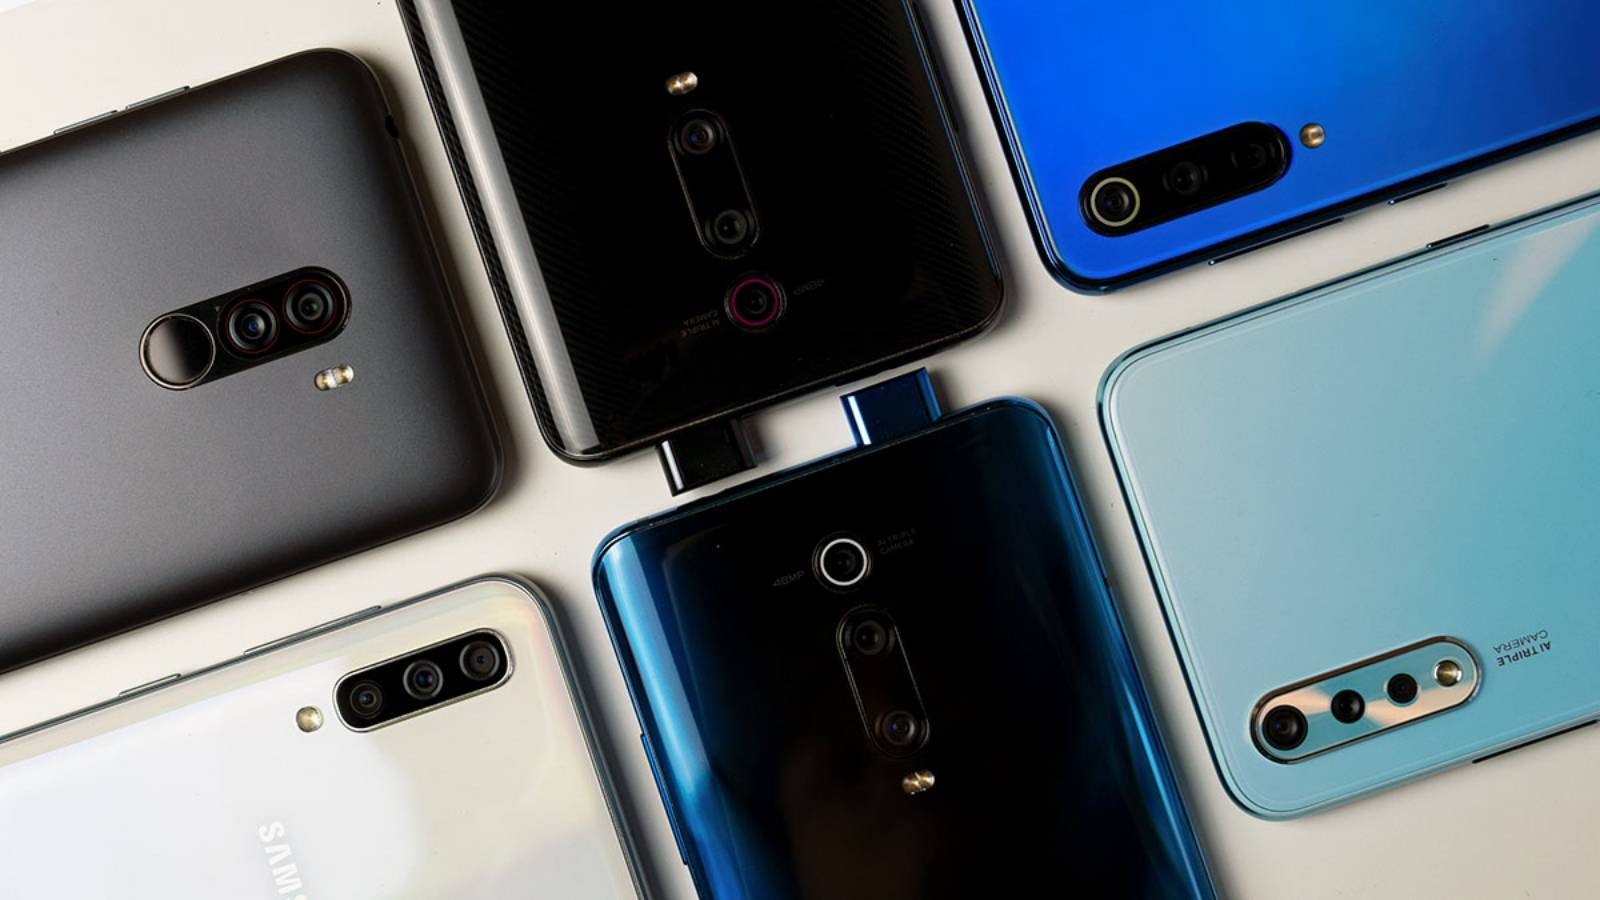 Nokia UMILESTE Samsung, Huawei, Xiaomi, OPPO cu Telefoanele procent actualizari Android